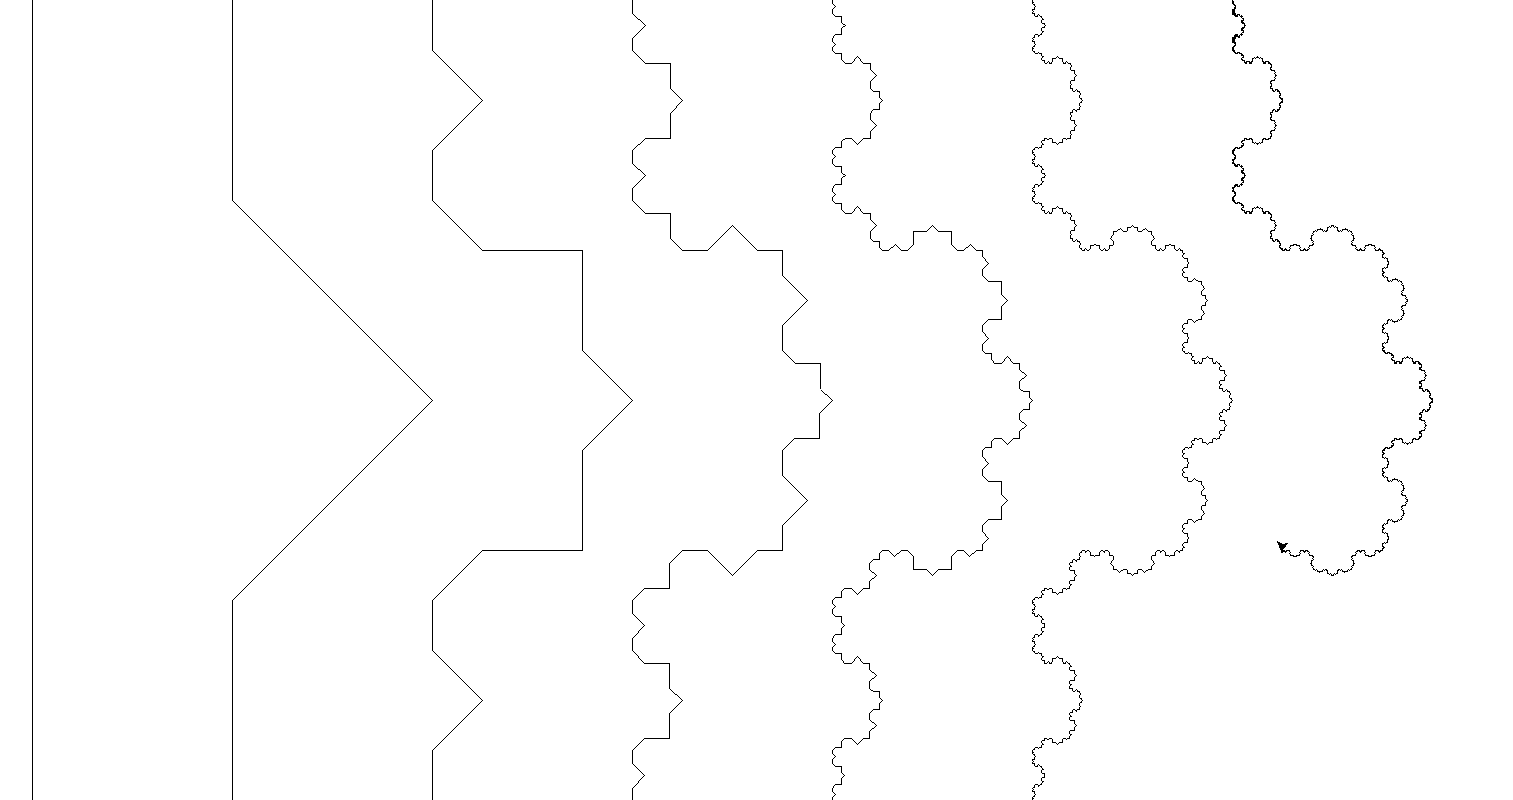 http://www.pererikstrandberg.se/blog/turtle/python-turtle-graphics-recursion-line.png